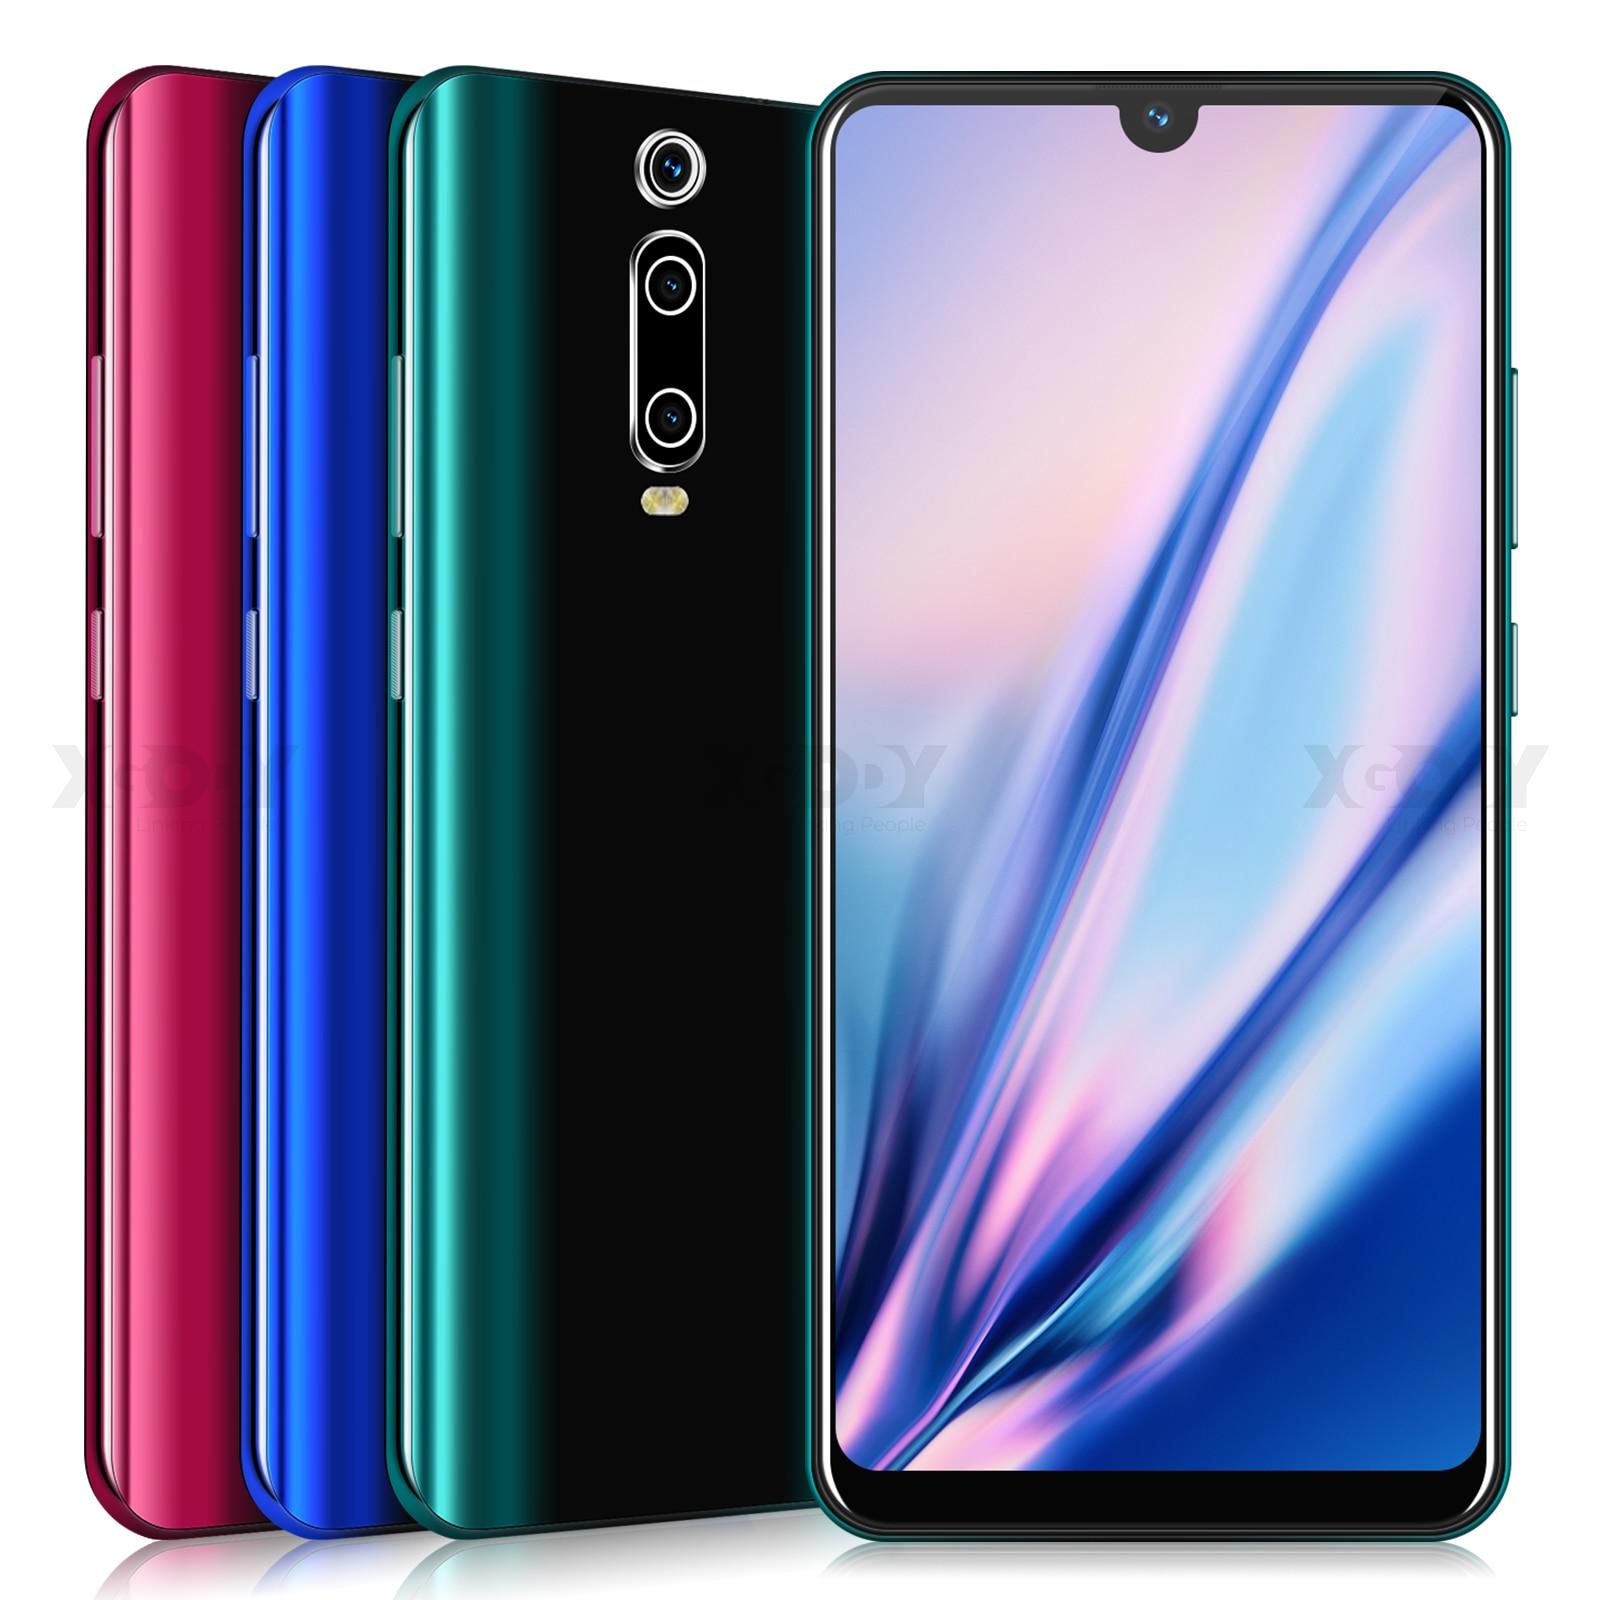 XGODY 3G Mobile Phone 9T 1GB 4GB 6.26'' QHD Screen MTK6580 Quad Core Android 9.0 Waterdrop Full Screen 2800mAh Smartphone